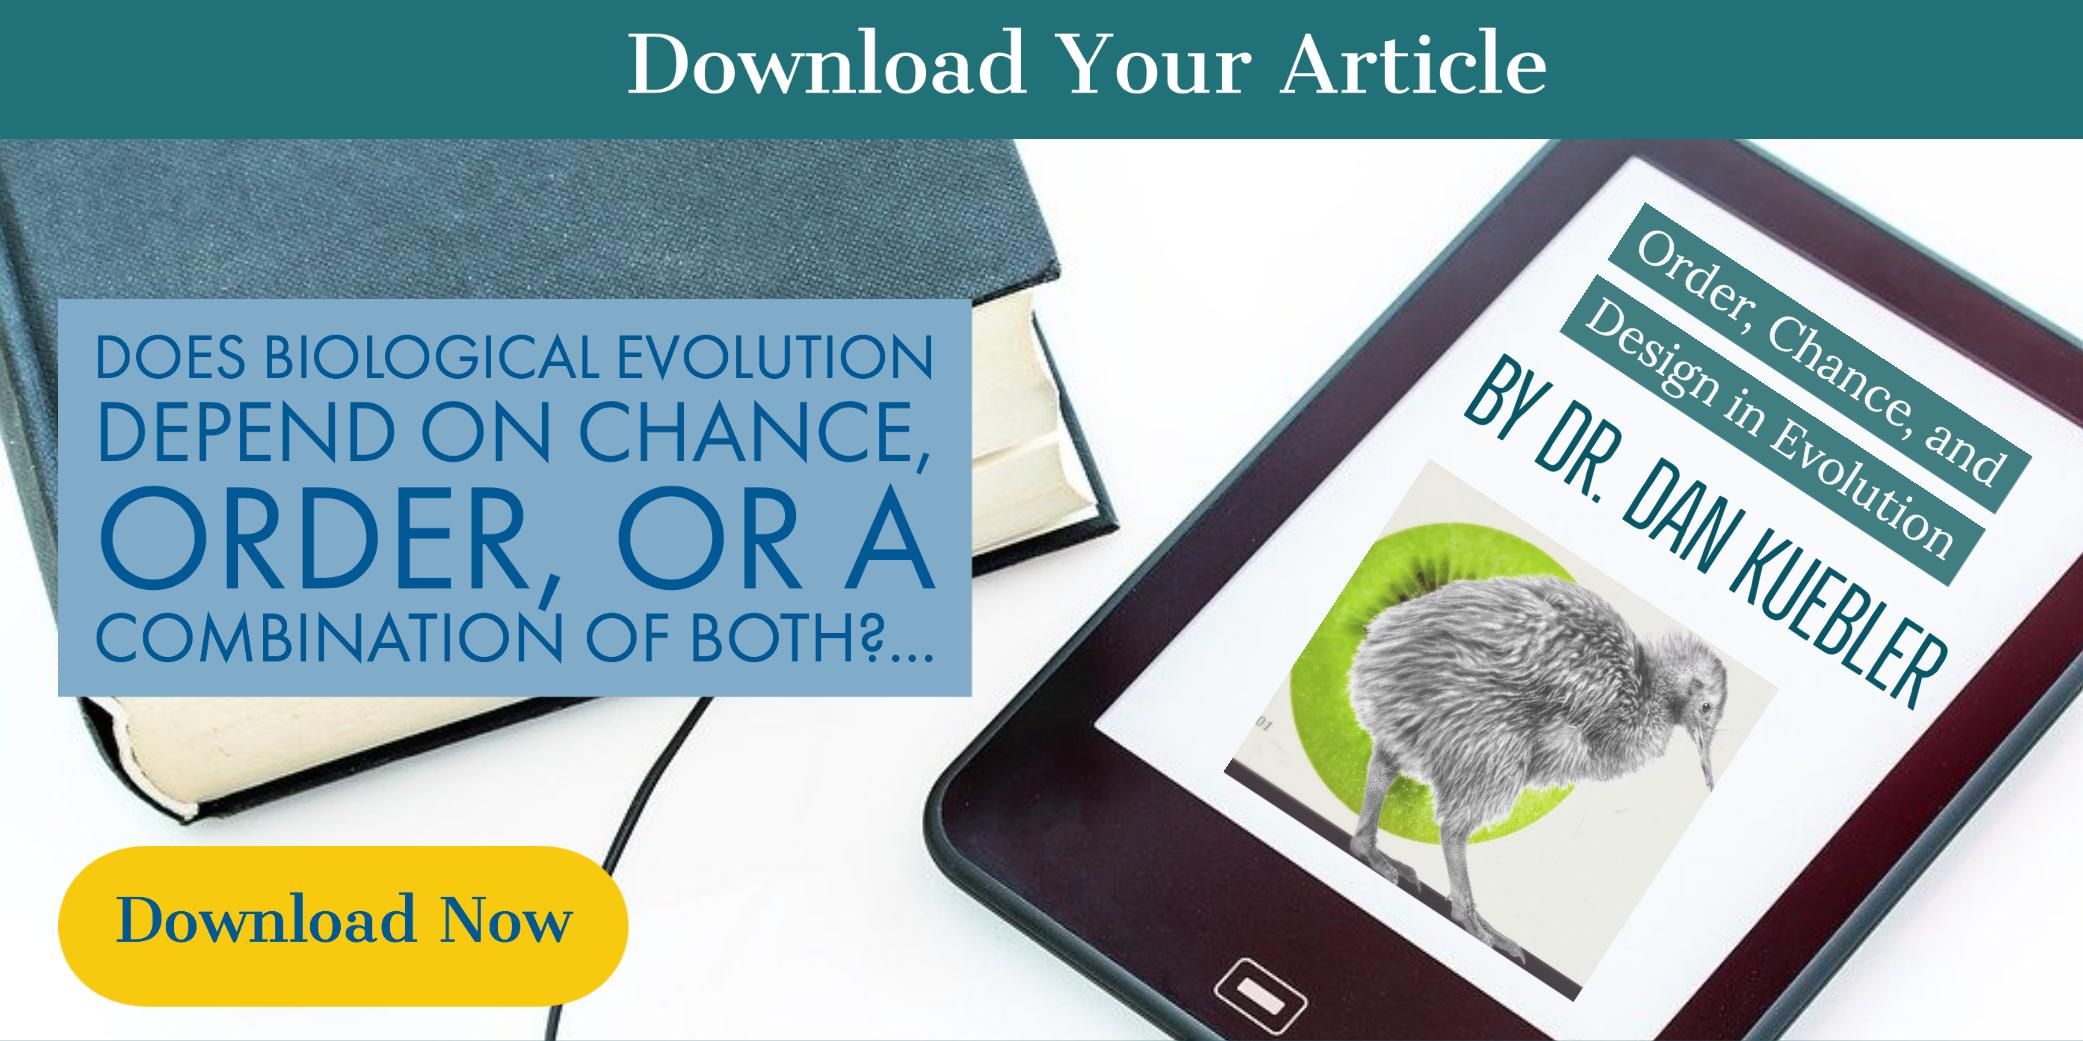 order, chance, and design in evolution download article by Dr. Dan Kuebler